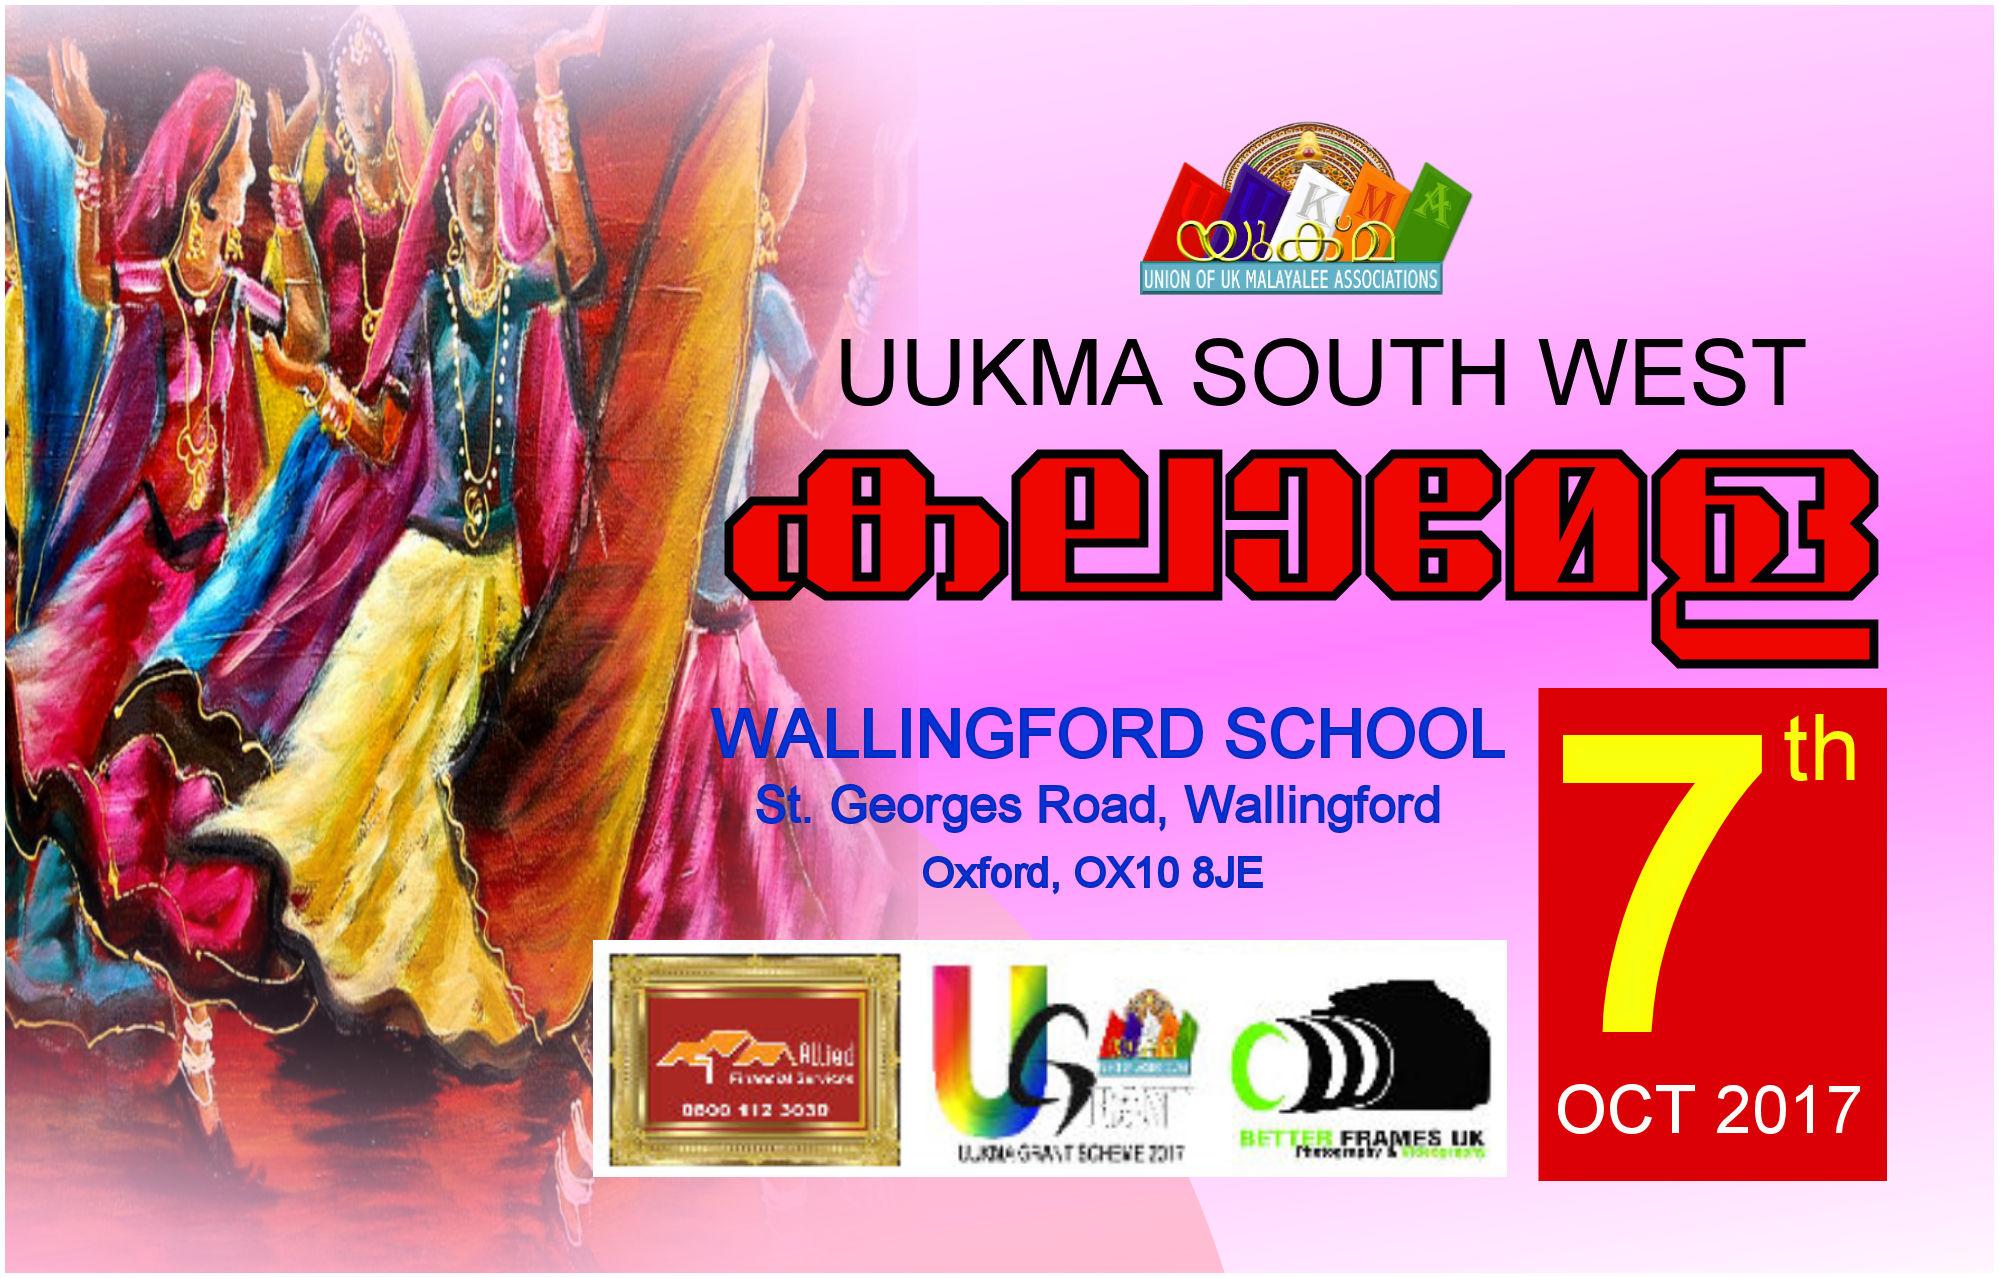 http://uukmanews.com/uukma-south-west-kalamela-committee-was-announced/